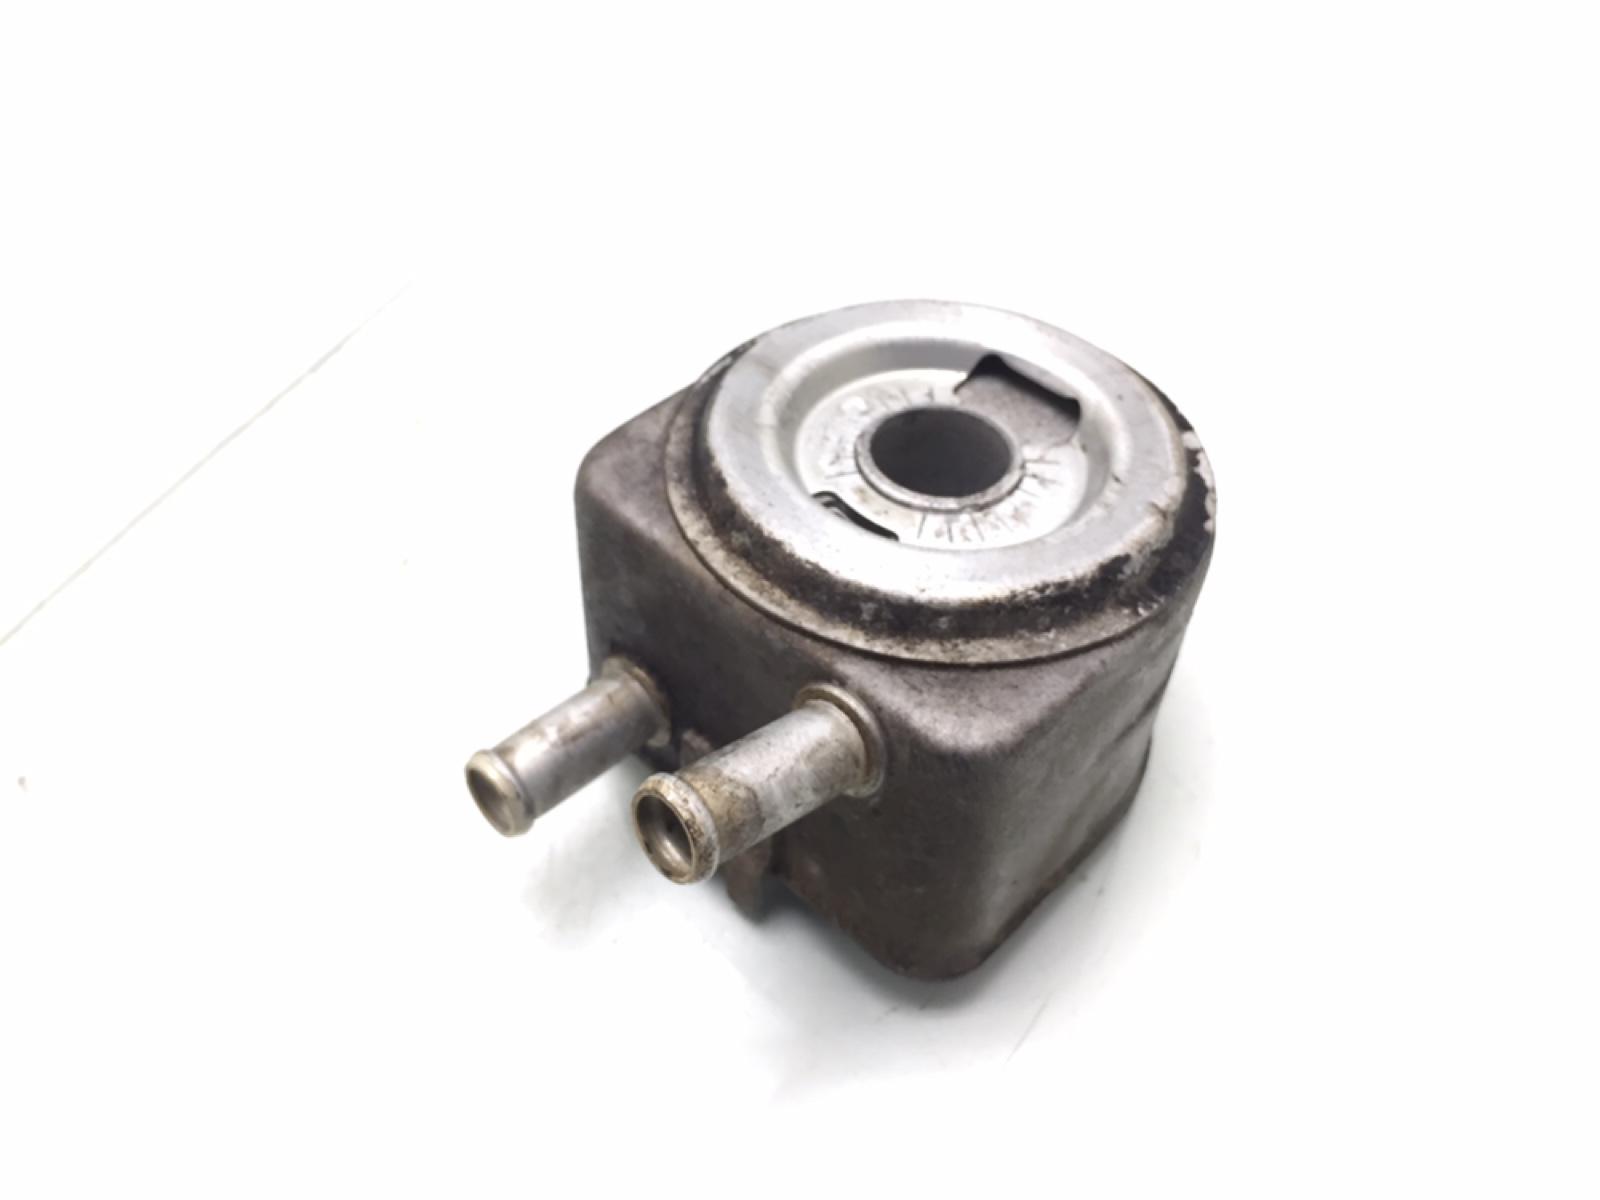 Радиатор масляный Citroen C5 2.2 HDI 2004 (б/у)